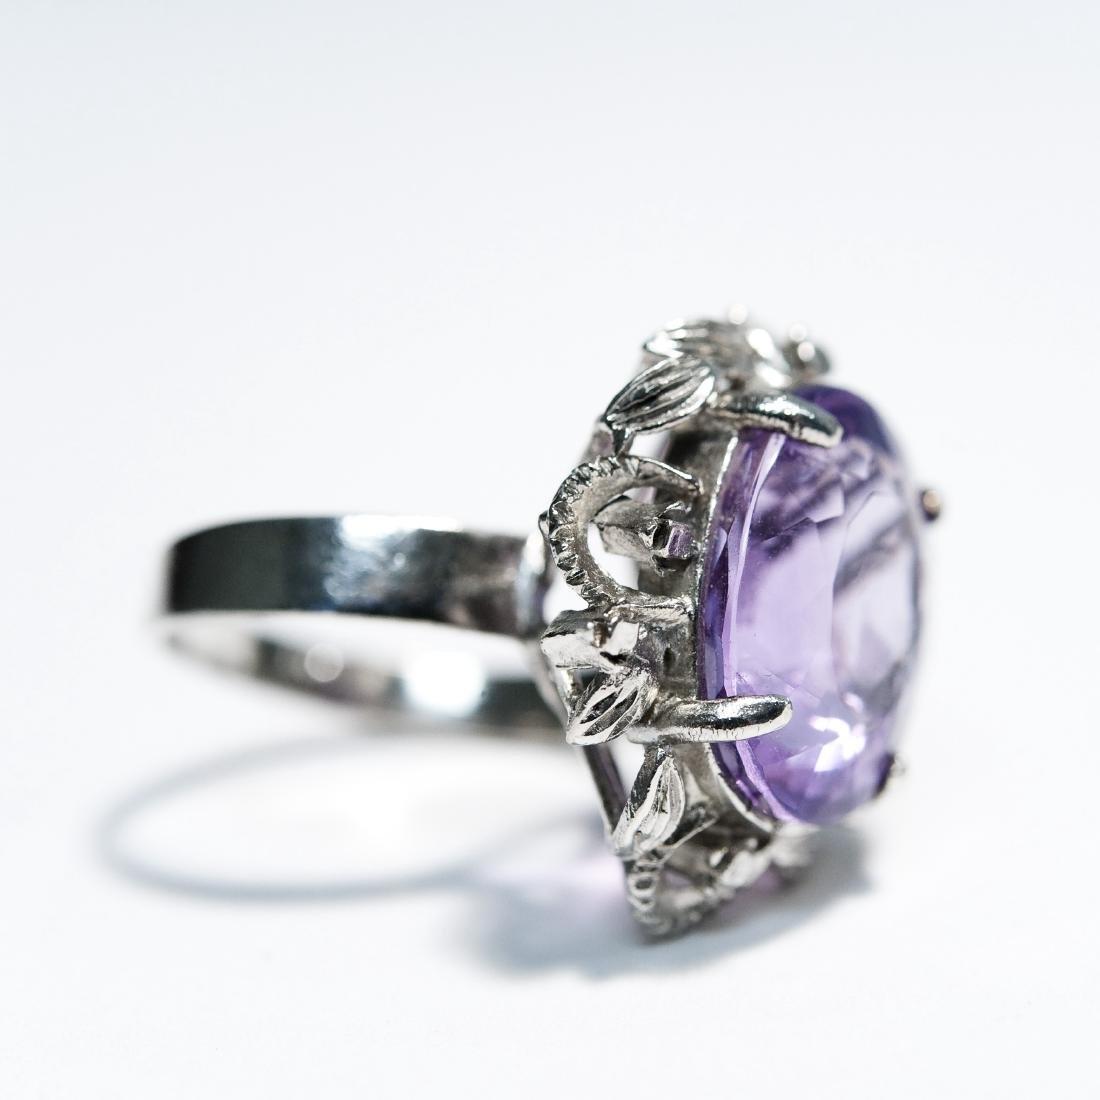 14K White Gold & Amethyst Ring. - 3